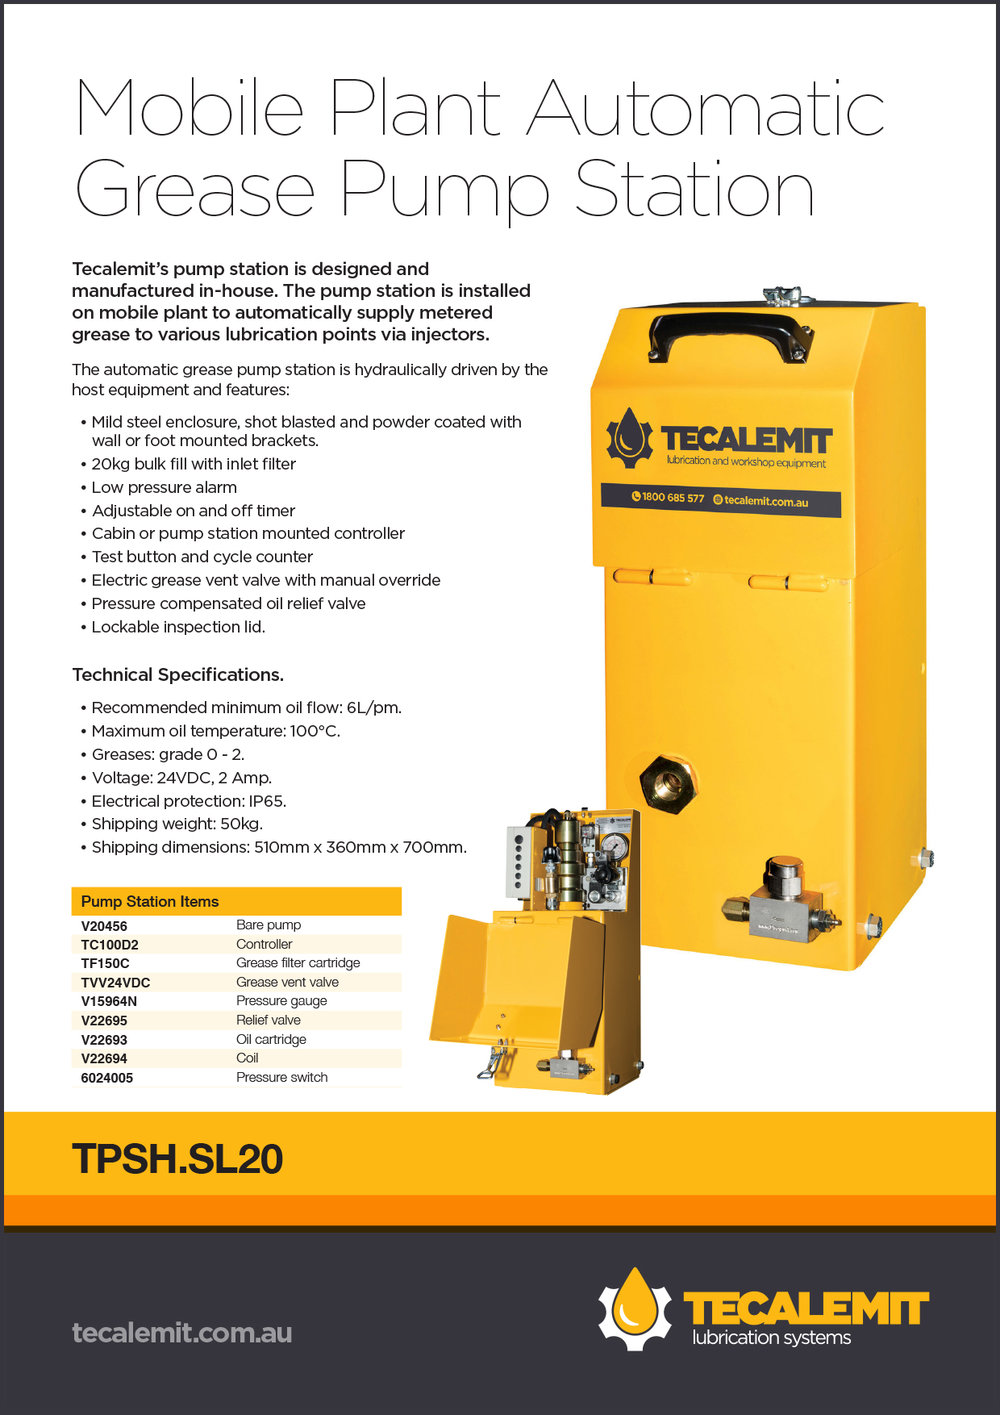 TPSH.SL20 Product Info